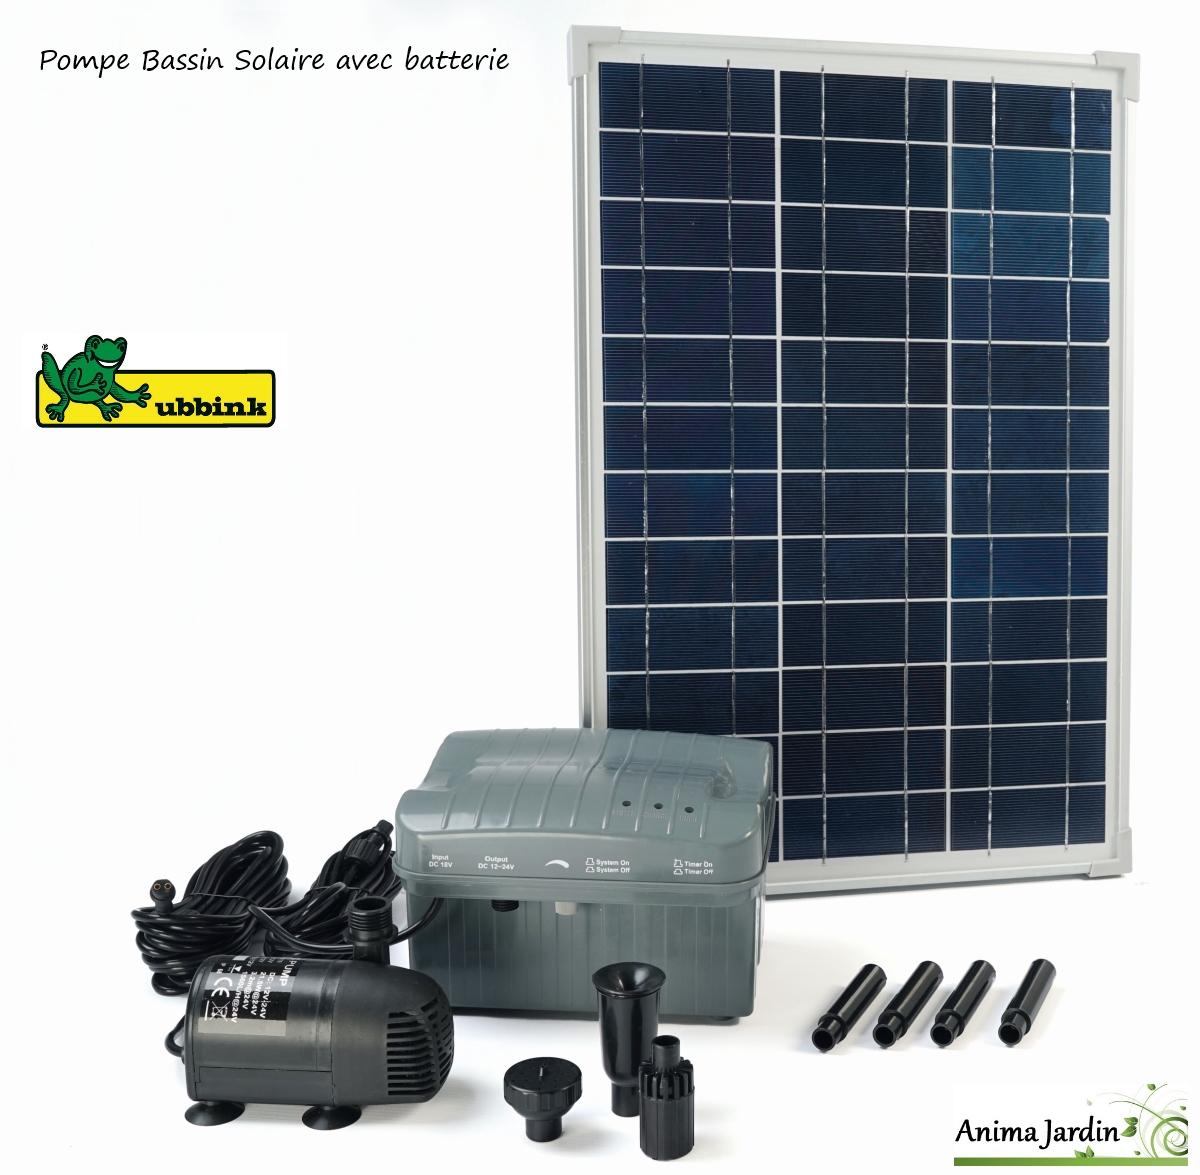 pompe-Solarmax-1000-ubbink-anima-jardin